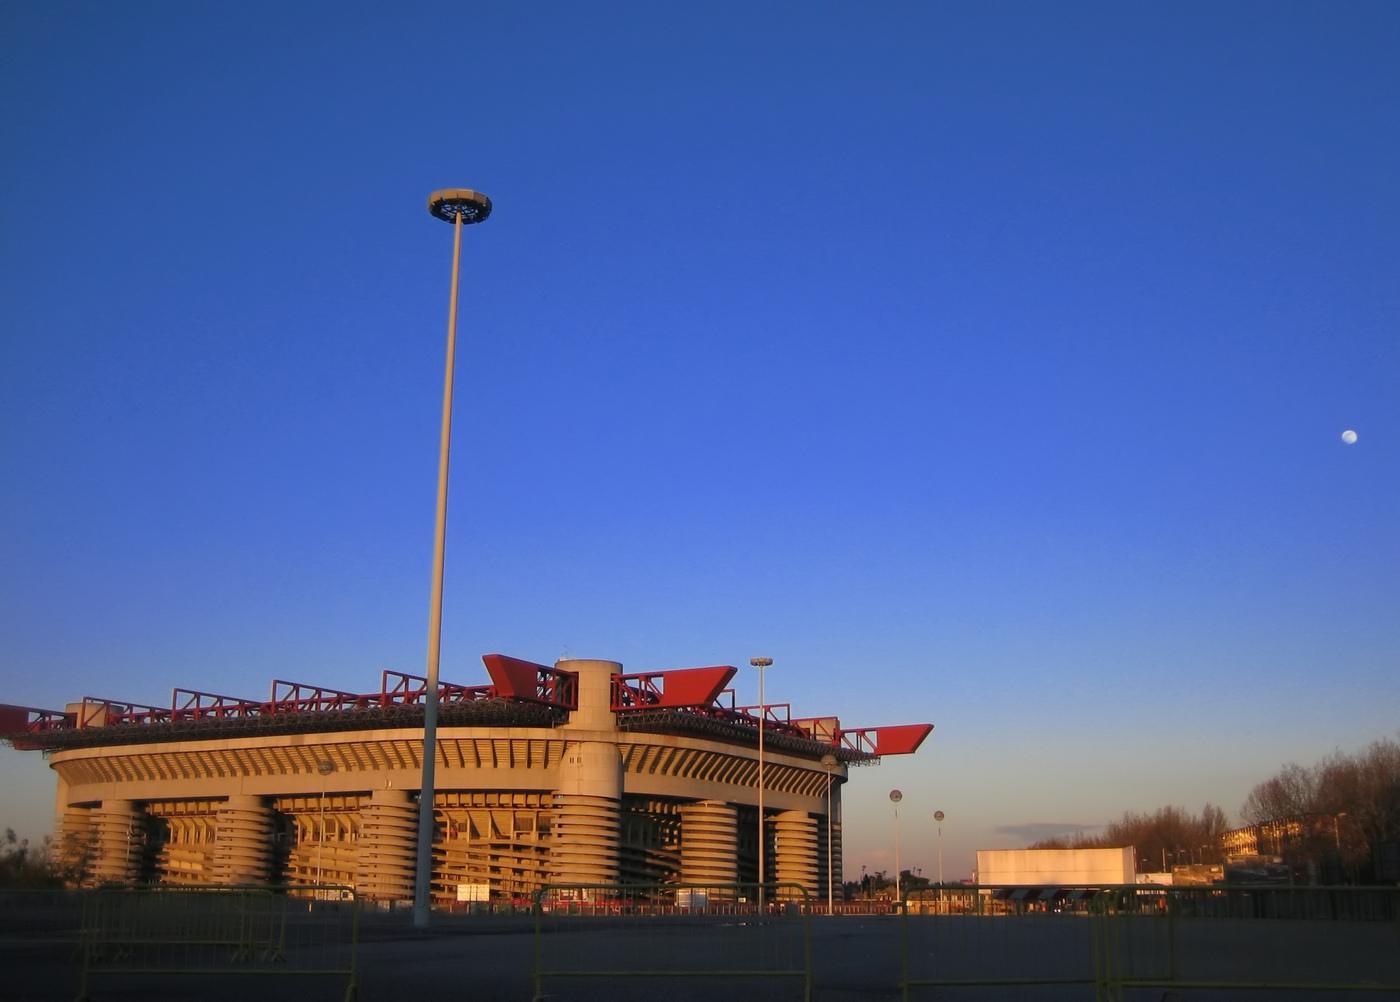 http://upload.wikimedia.org/wikipedia/commons/e/e4/Stadio_San_Siro_-_Giuseppe_Meazza,_Milano.jpg